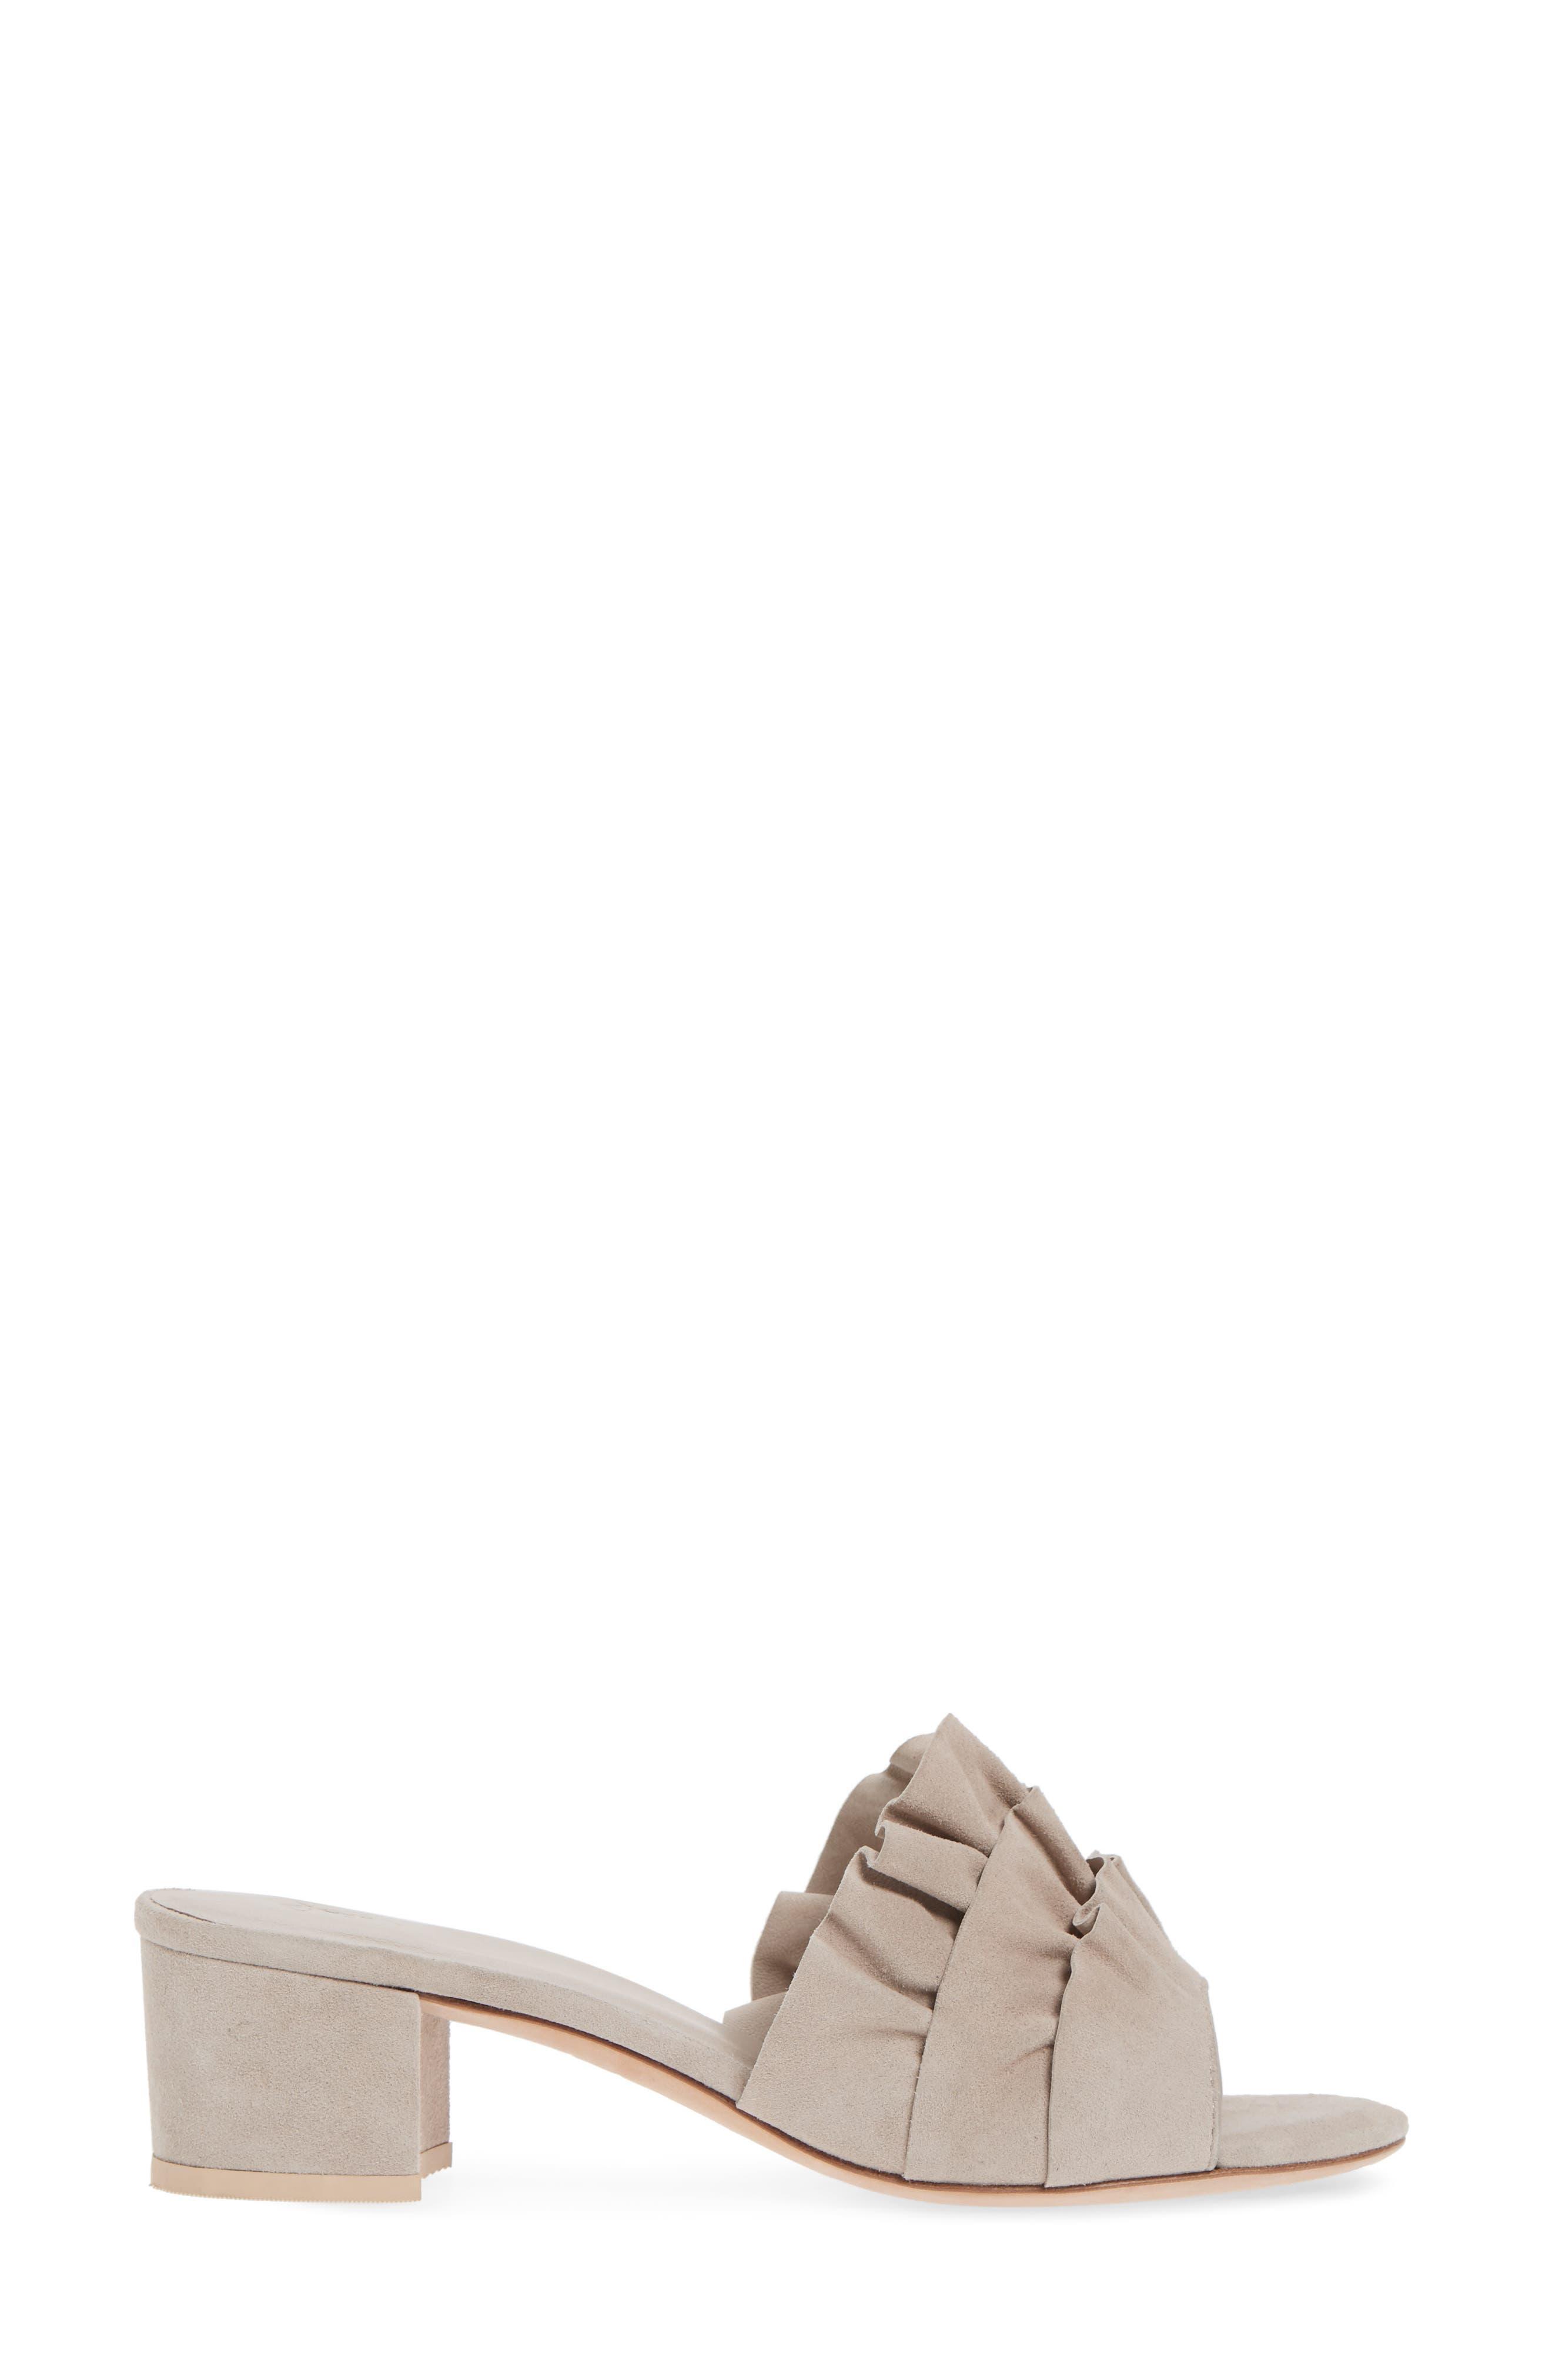 Mai Ruffle Slide Sandal,                             Alternate thumbnail 6, color,